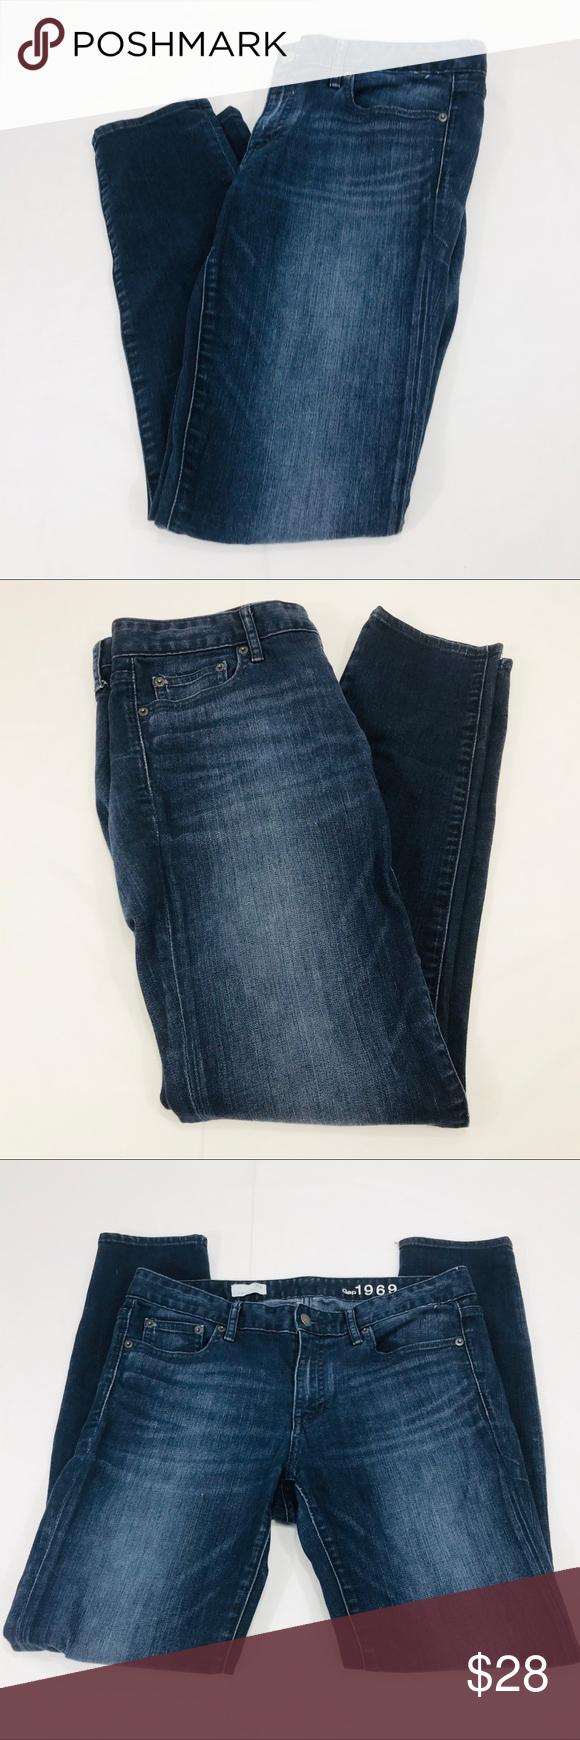 Men S Dark Blue Jeans 29x32 Dark Blue Jeans Fashion Blue Jeans